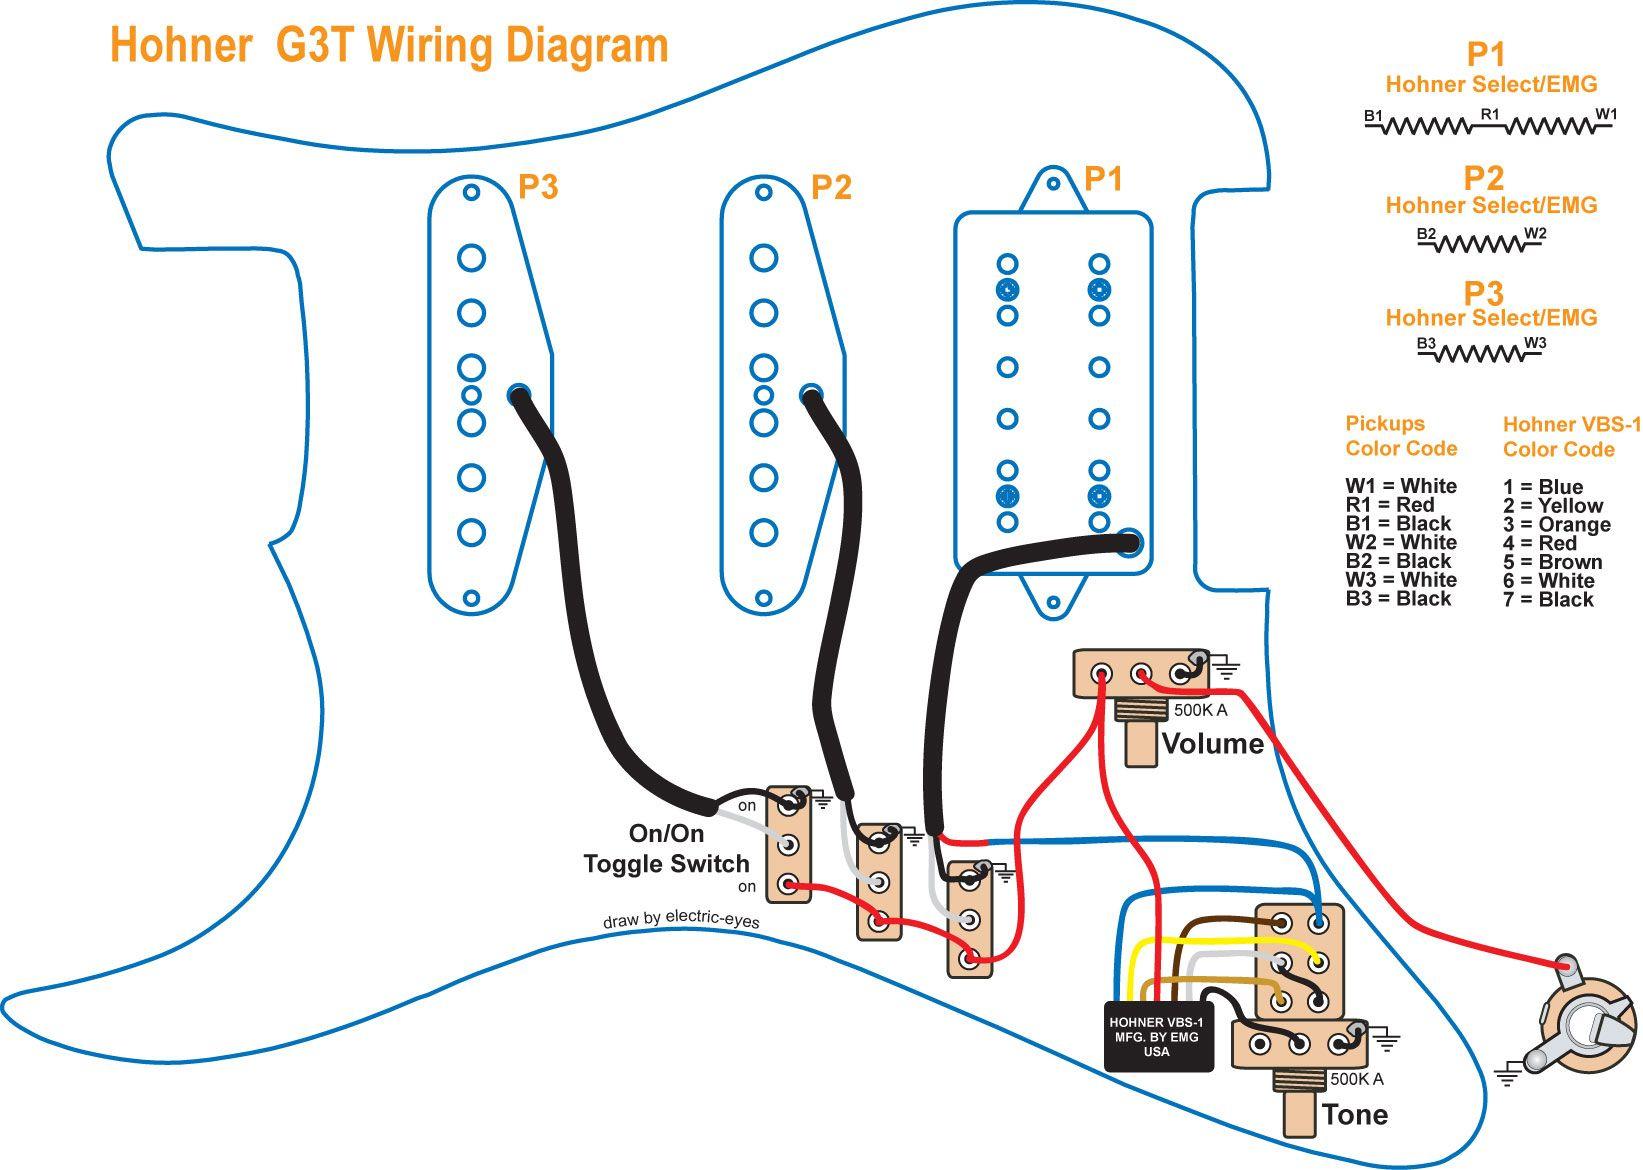 Wiring Diagram Of Electric Guitar - Wiring Diagram Detailed - Electric Guitar Wiring Diagram